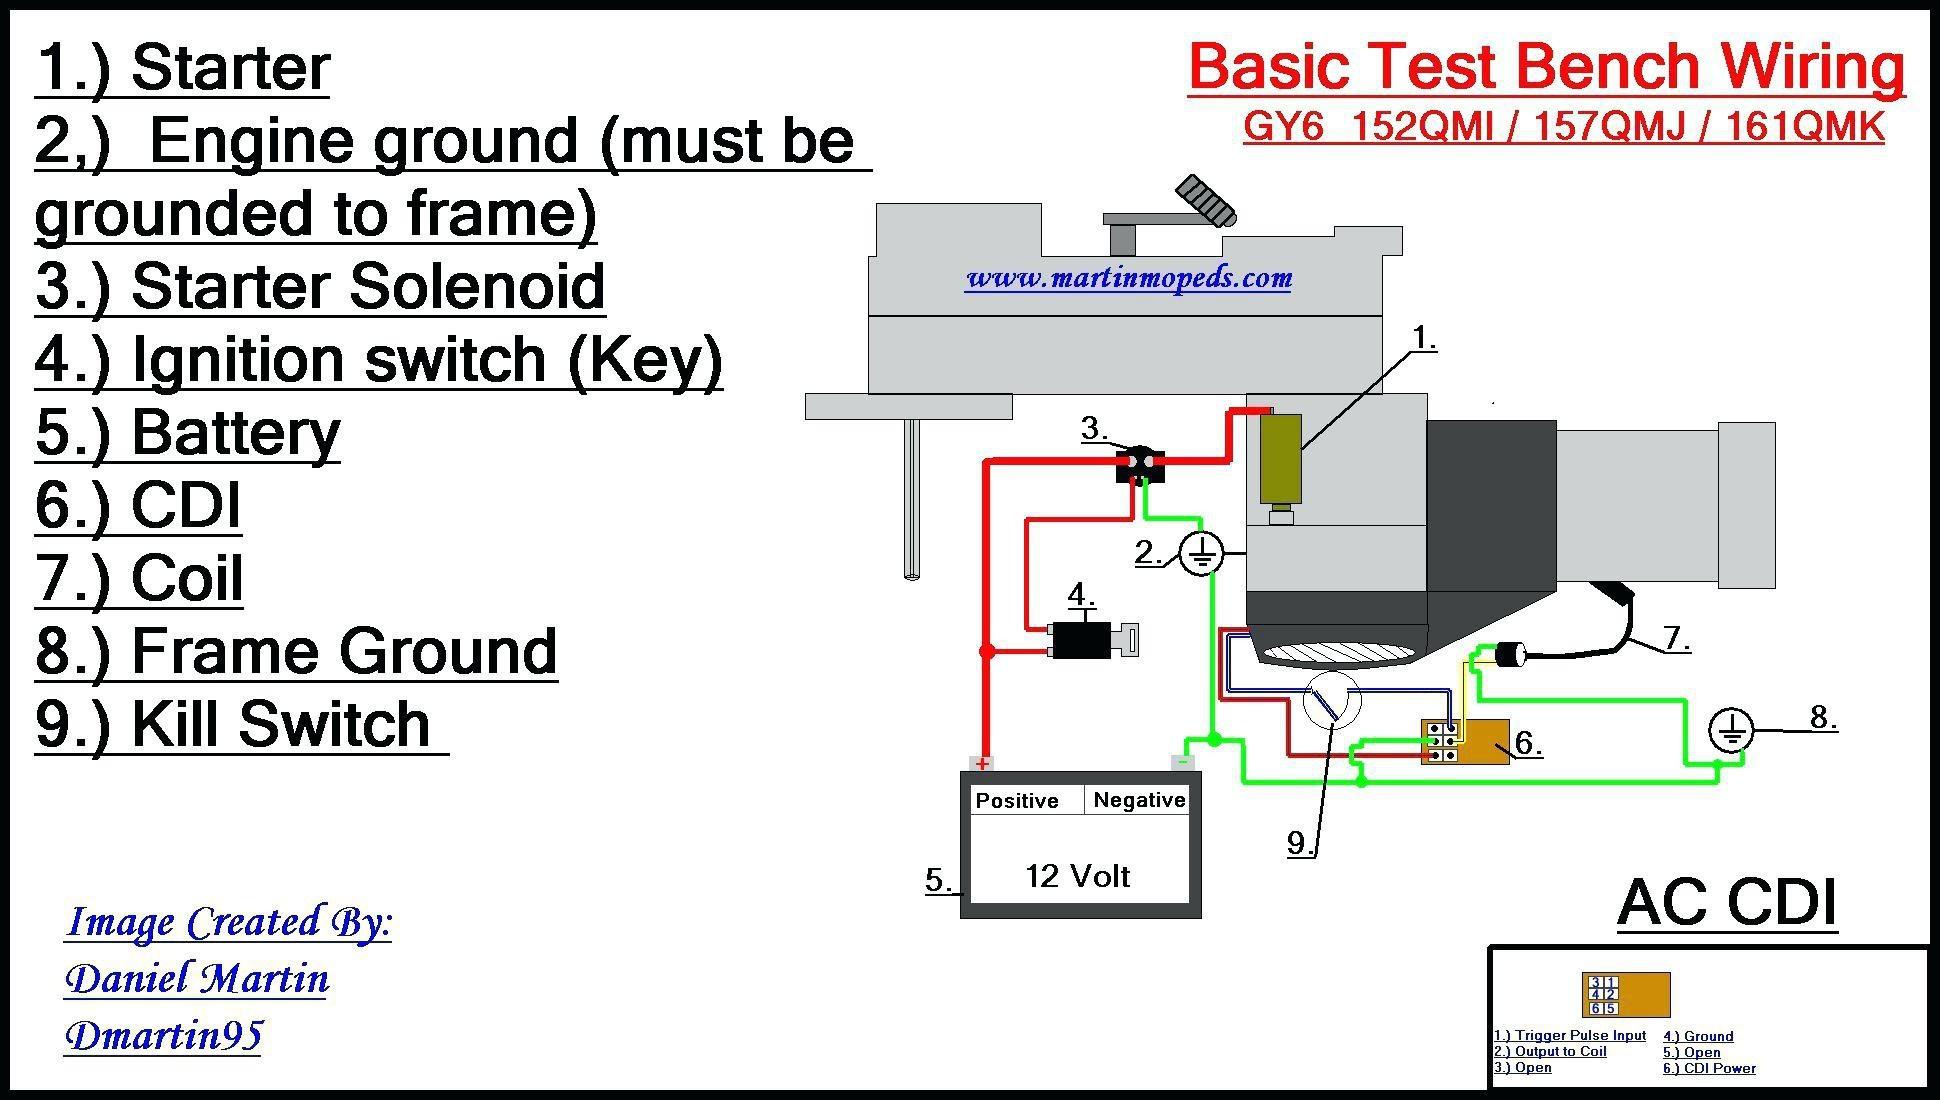 Trailer Wiring Diagram 4 Pin Unique   Wiring Diagram Image